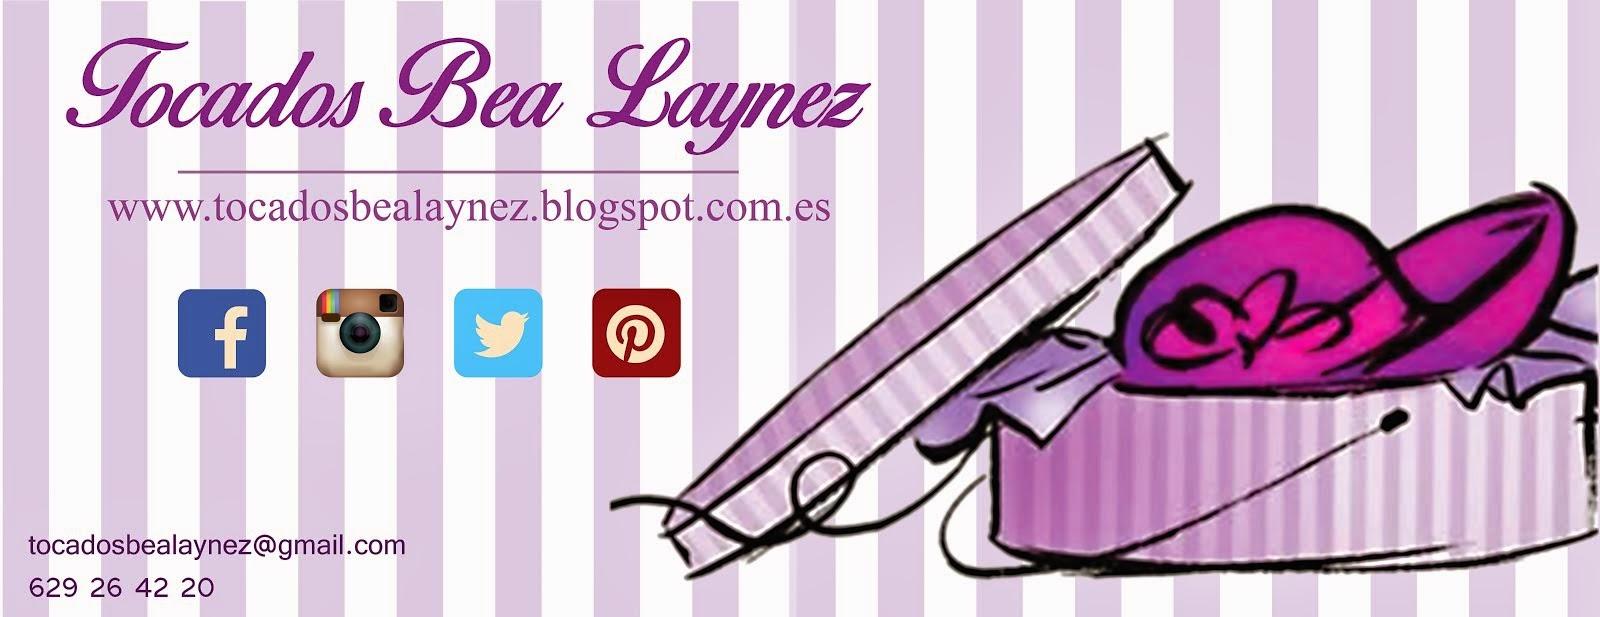 Lona Tocados Bea Laynez